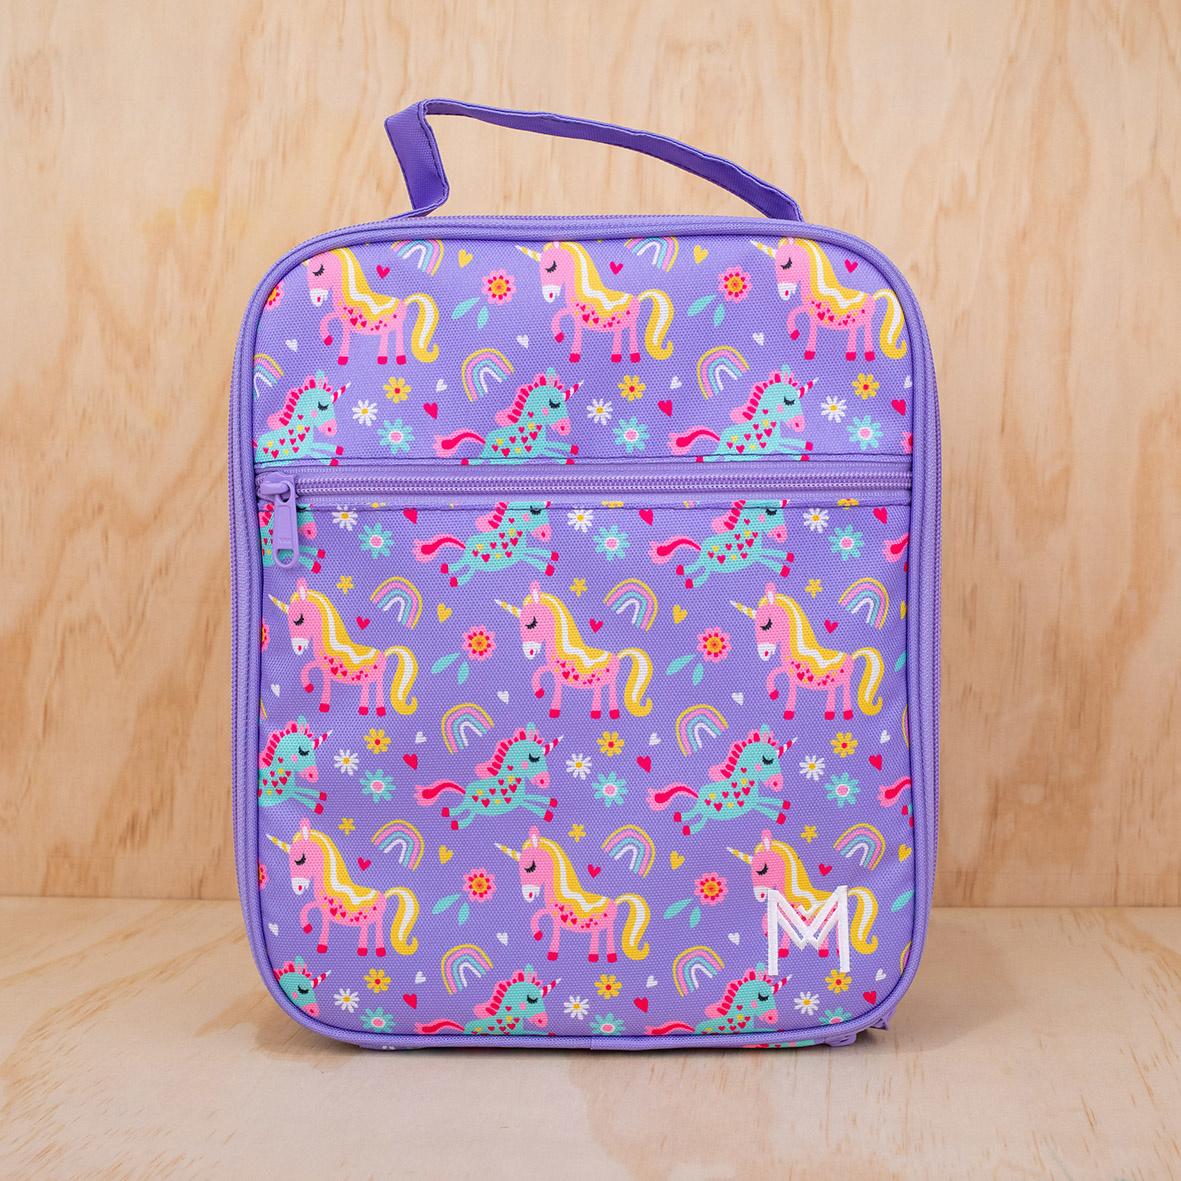 Montii insulated Lunch Bag - Unicorn V3-1